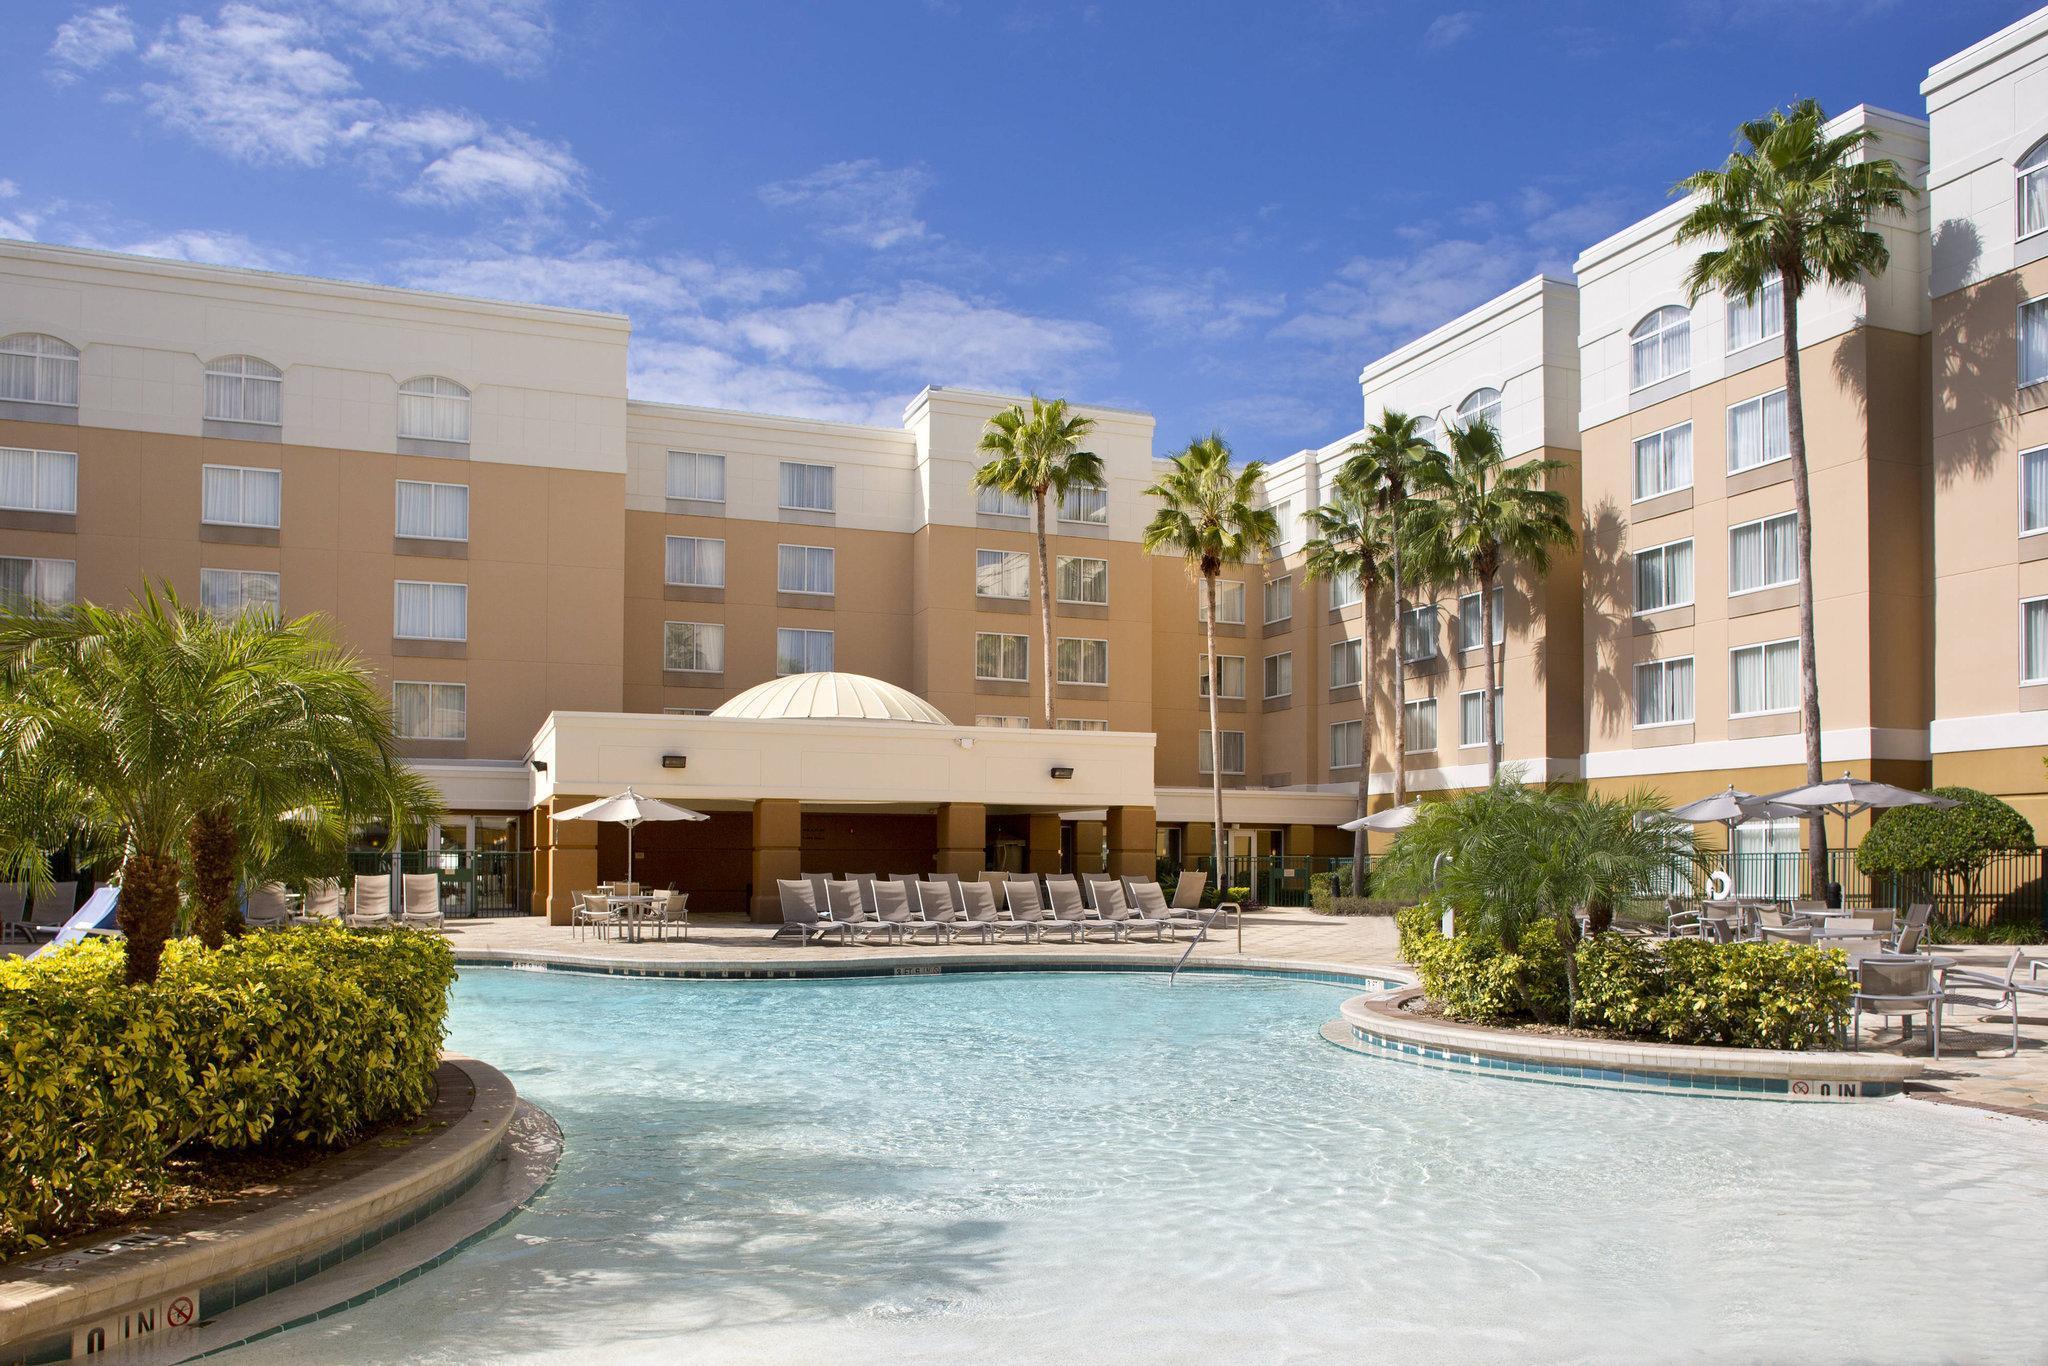 SpringHill Suites Orlando Lake Buena Vista In Marriott Village Orlando (FL) United States